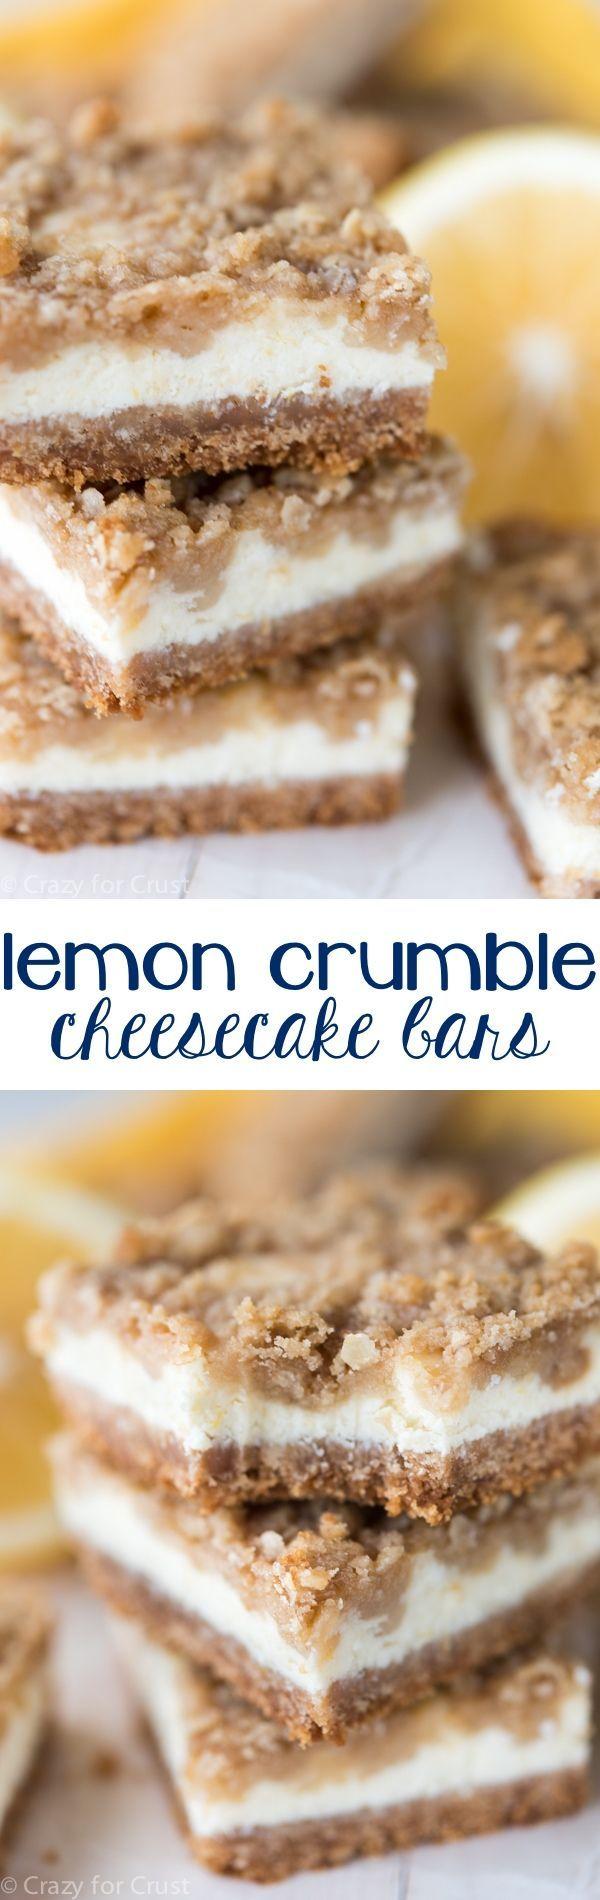 Lemon Crumble Cheesecake Bars - this cheesecake bar recipe has it all! A Nilla Wafer crust, lemon cheesecake, and lemon crumble!